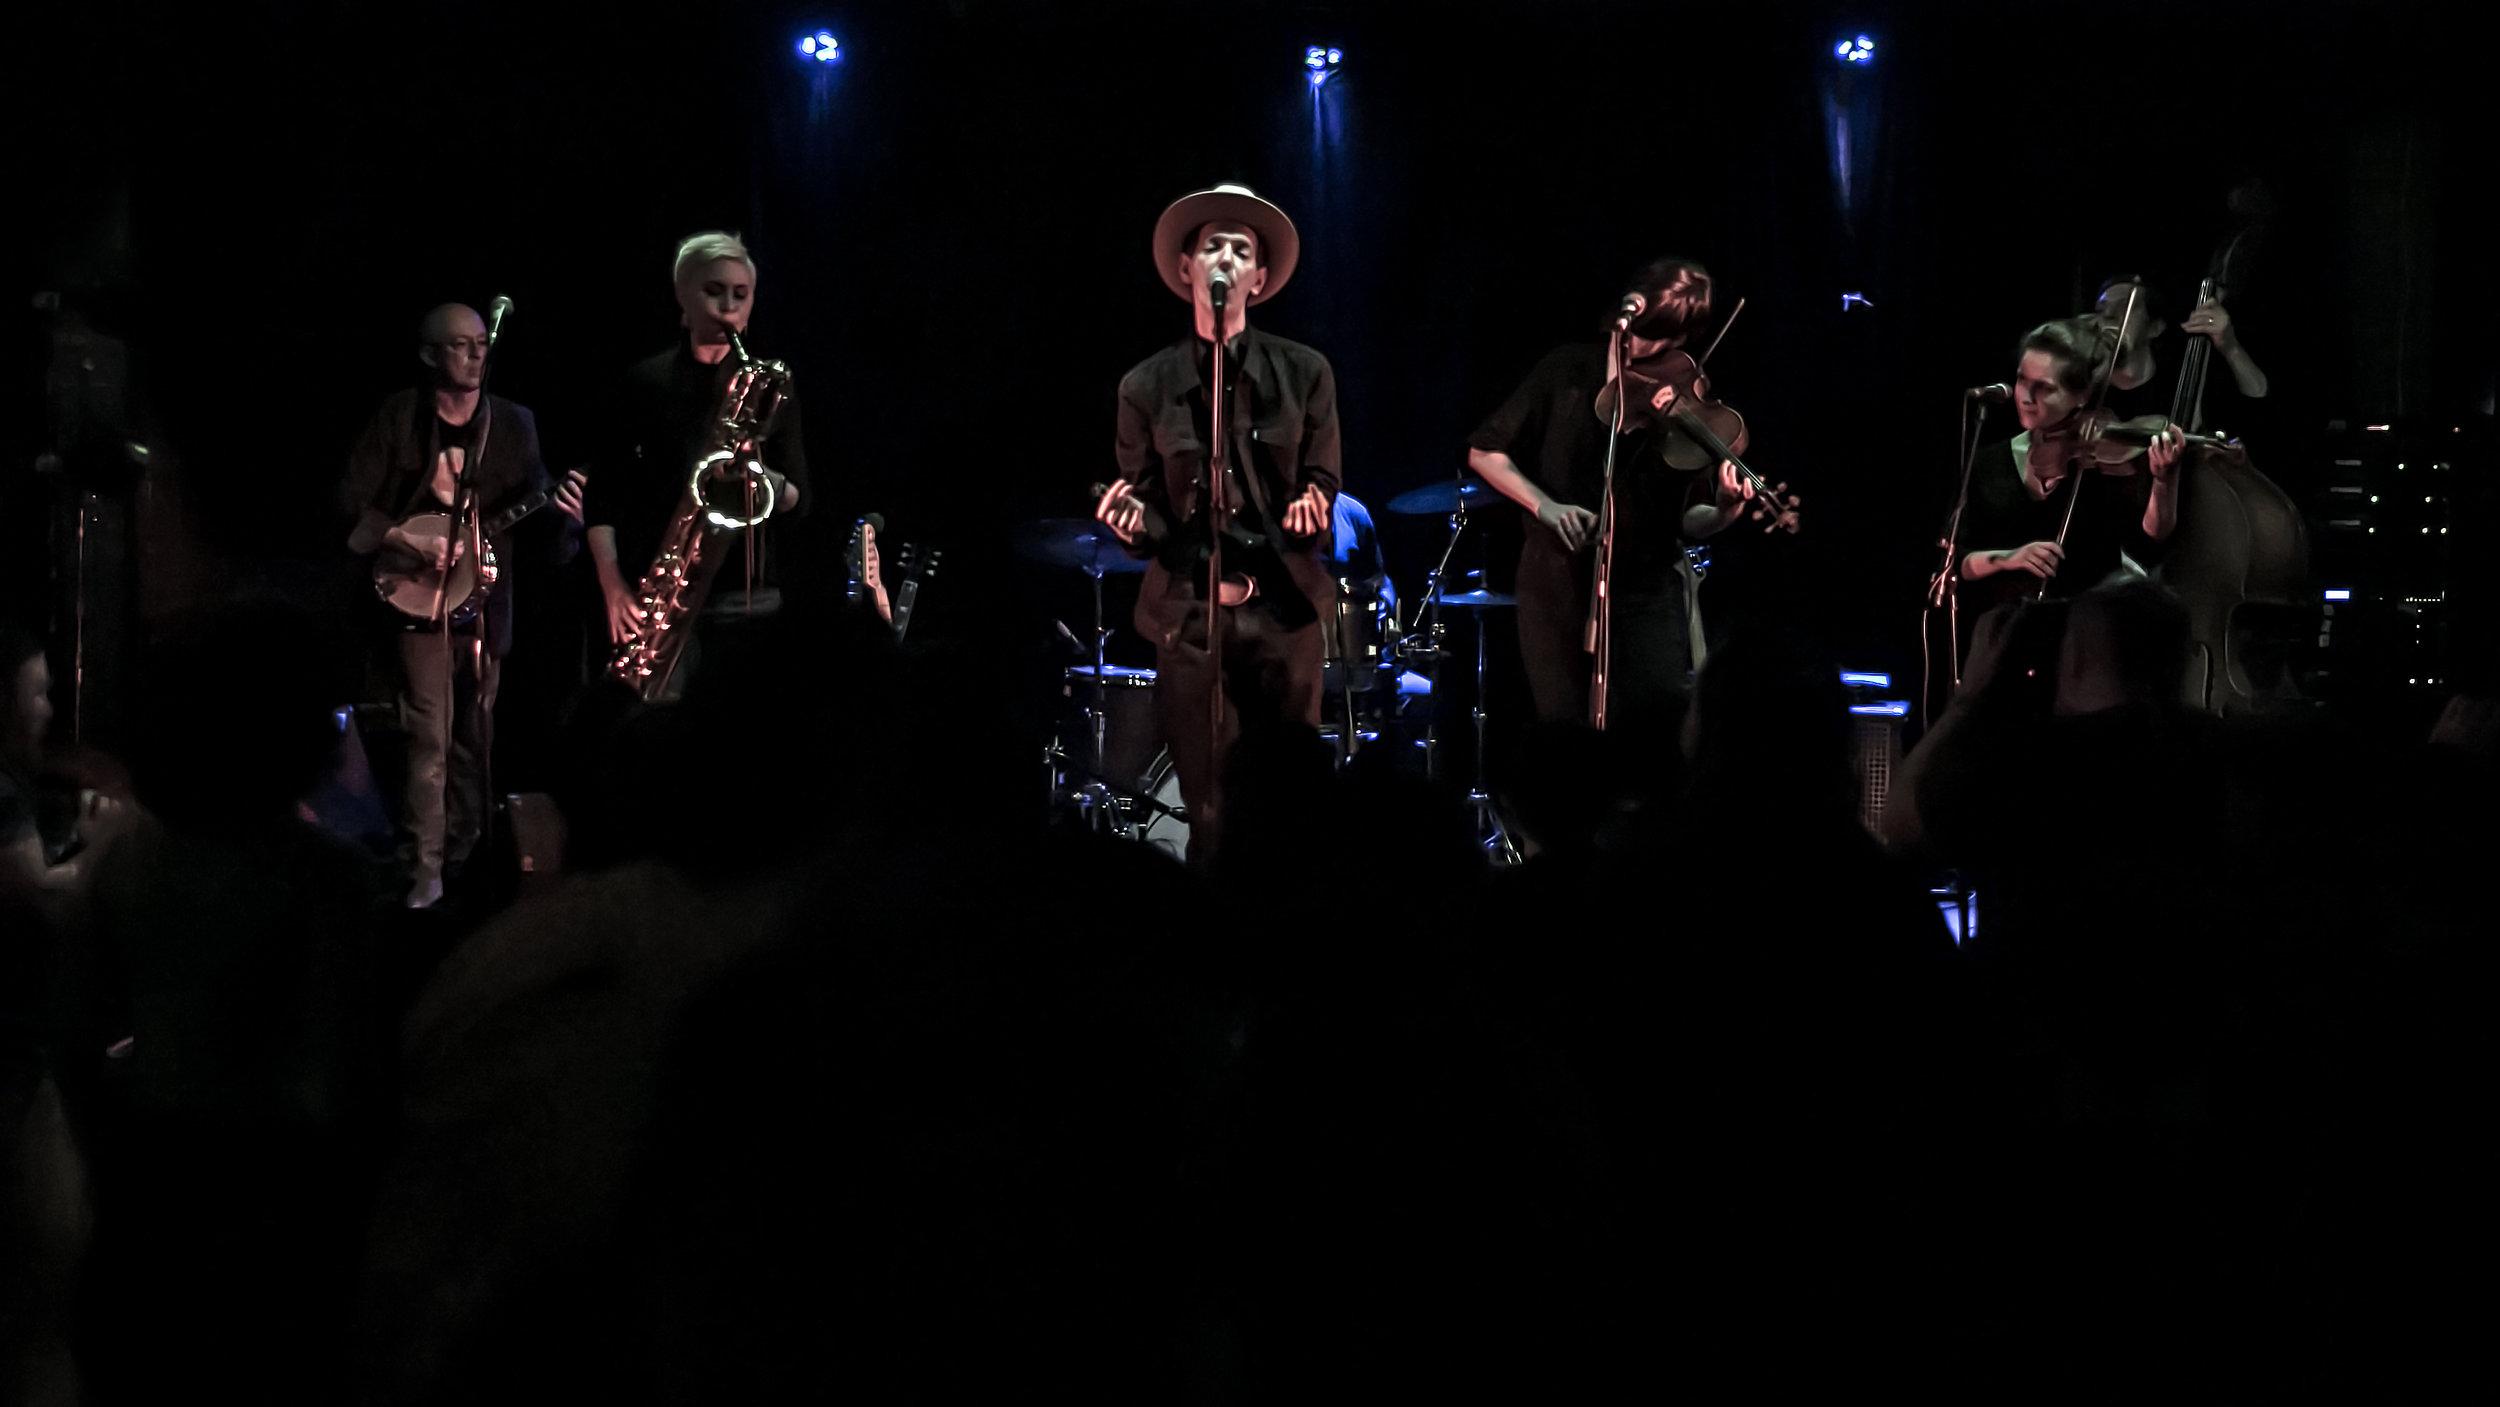 Photo by Steve Benoit / Boston Concert Photography